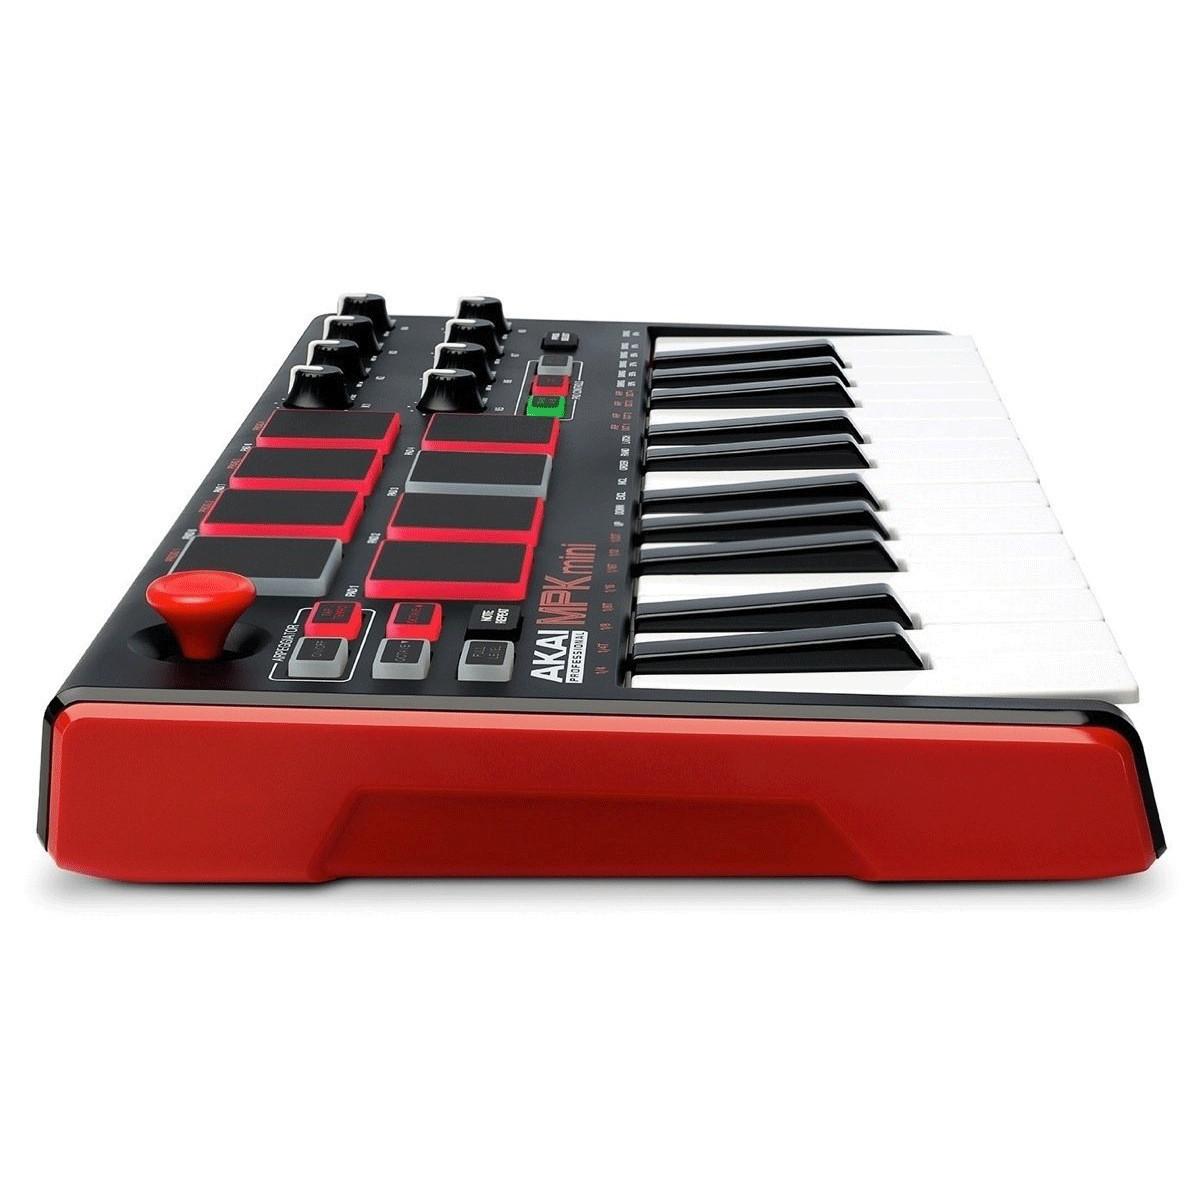 akai mpk mini mk 2 laptop production keyboard box opened at gear4music. Black Bedroom Furniture Sets. Home Design Ideas